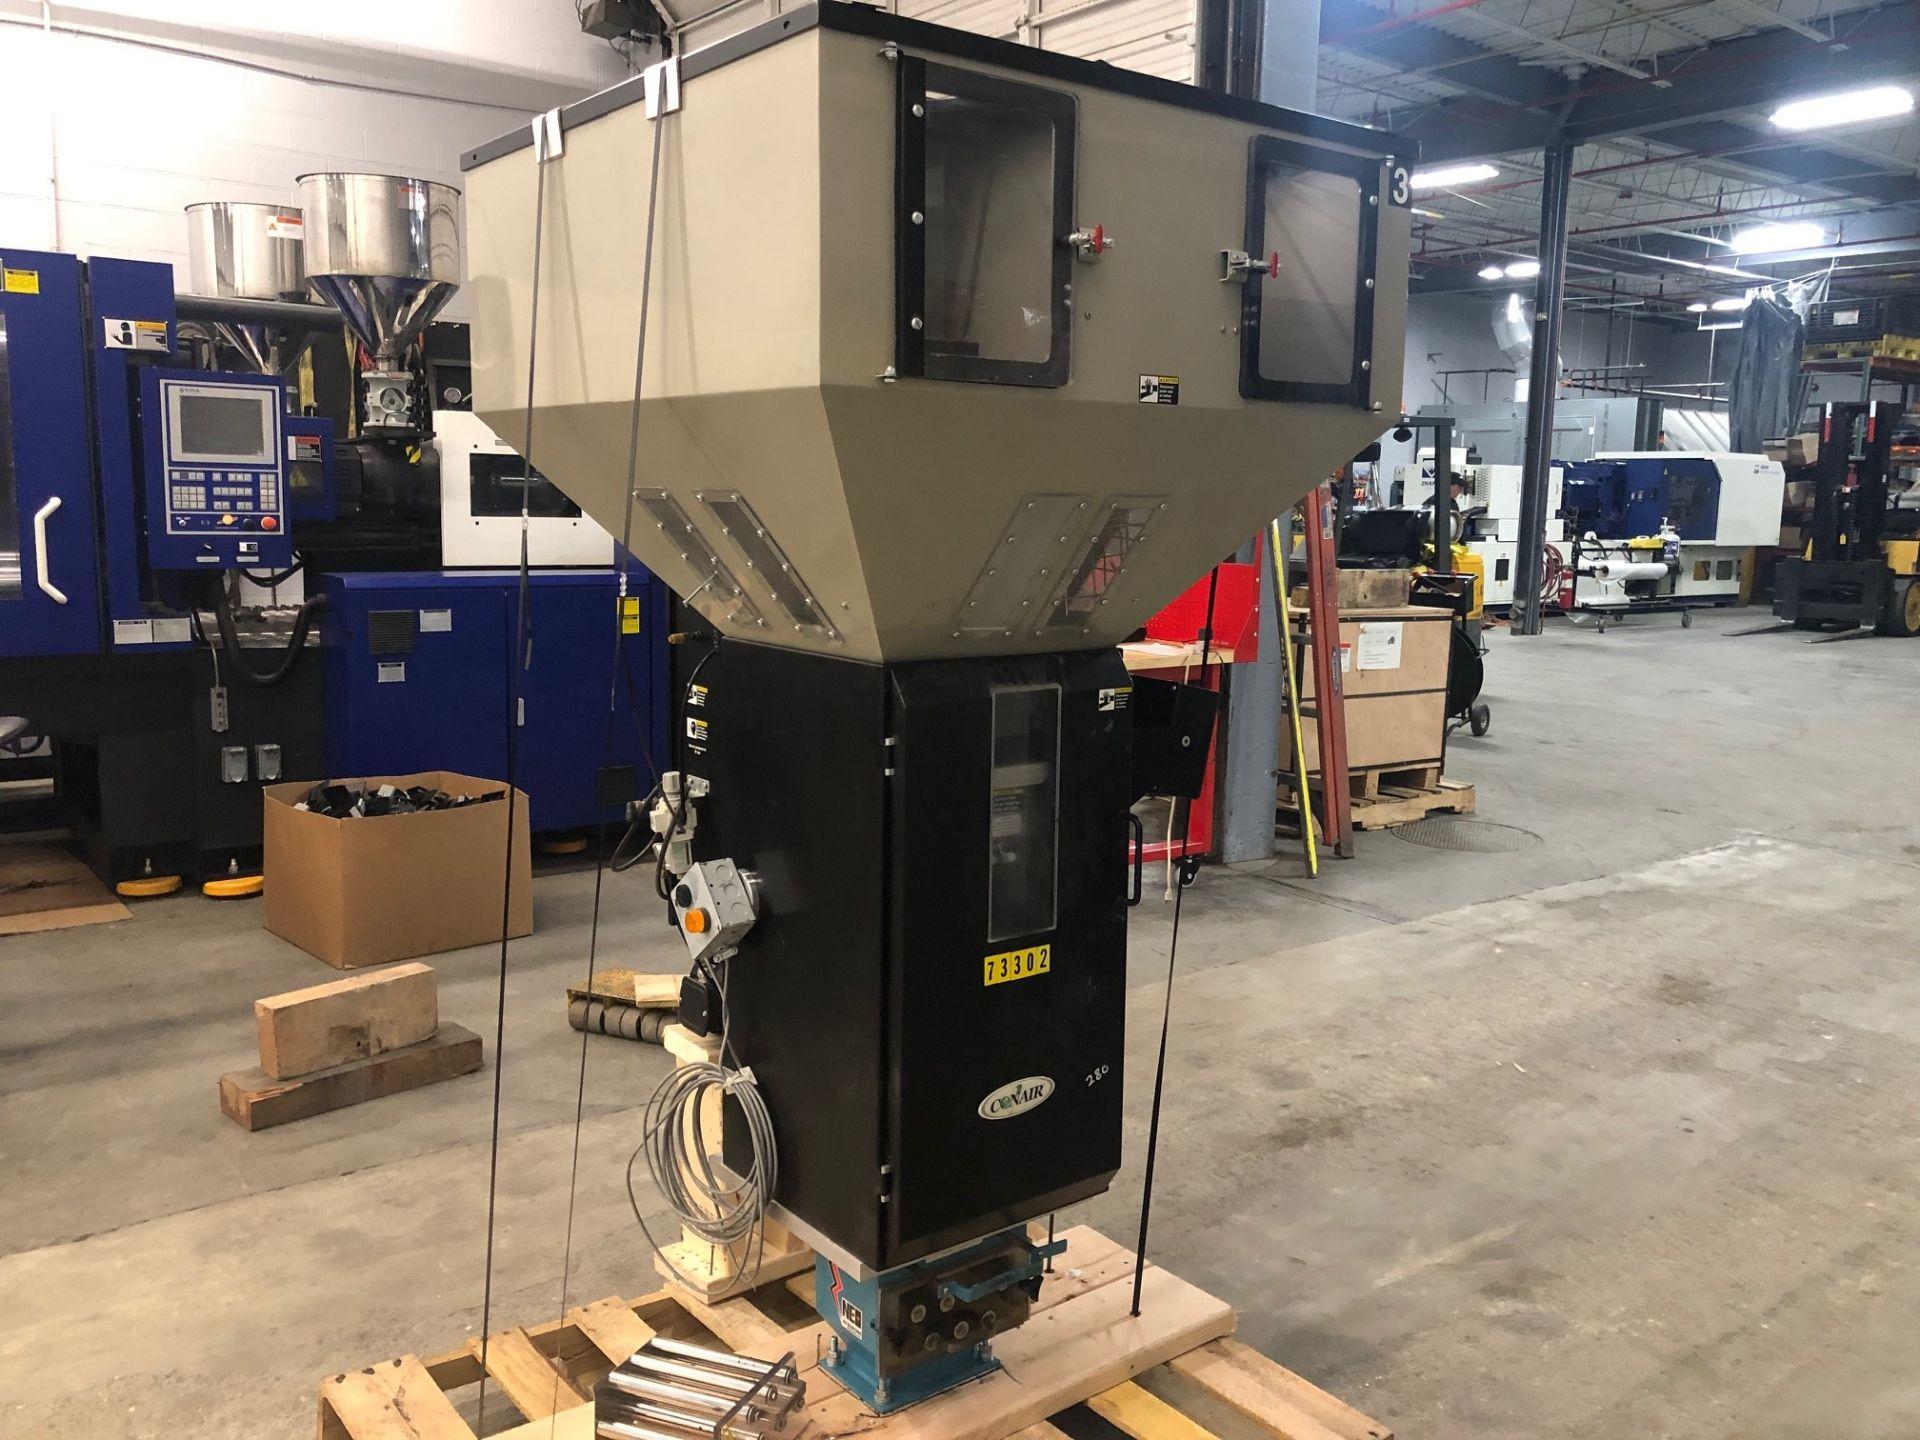 Lot 118 - Conair 950 lbs/hr 4-Component Blender